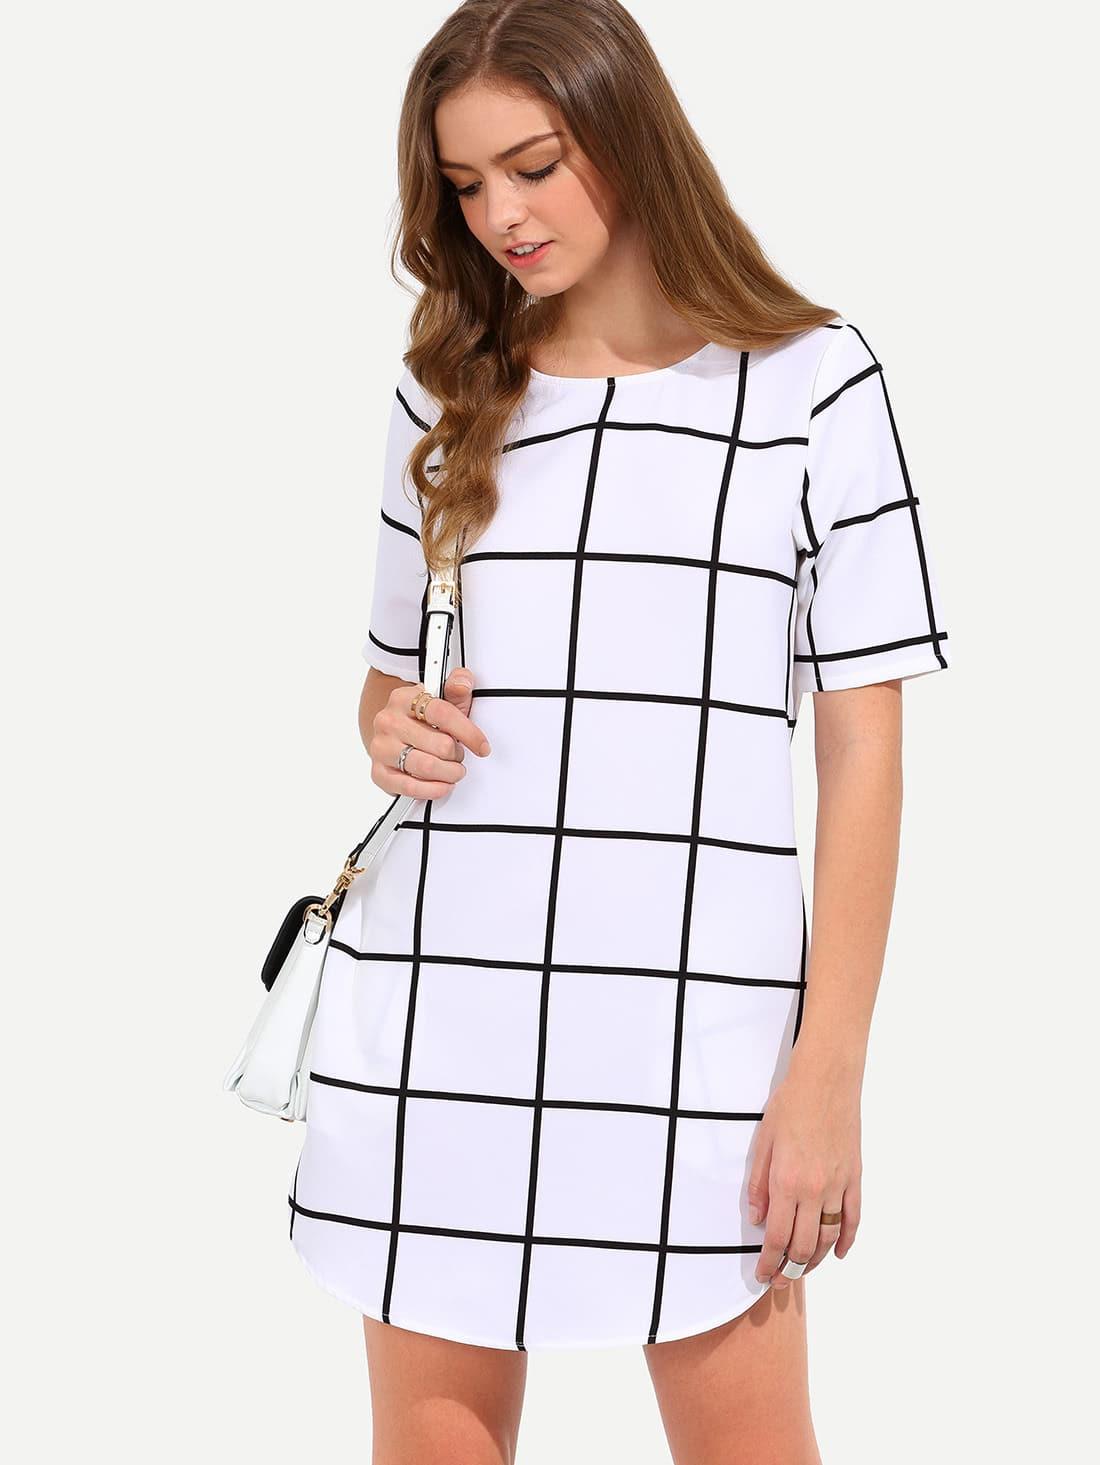 Plaid Pocket Check Curved Hem Dress thumbnail